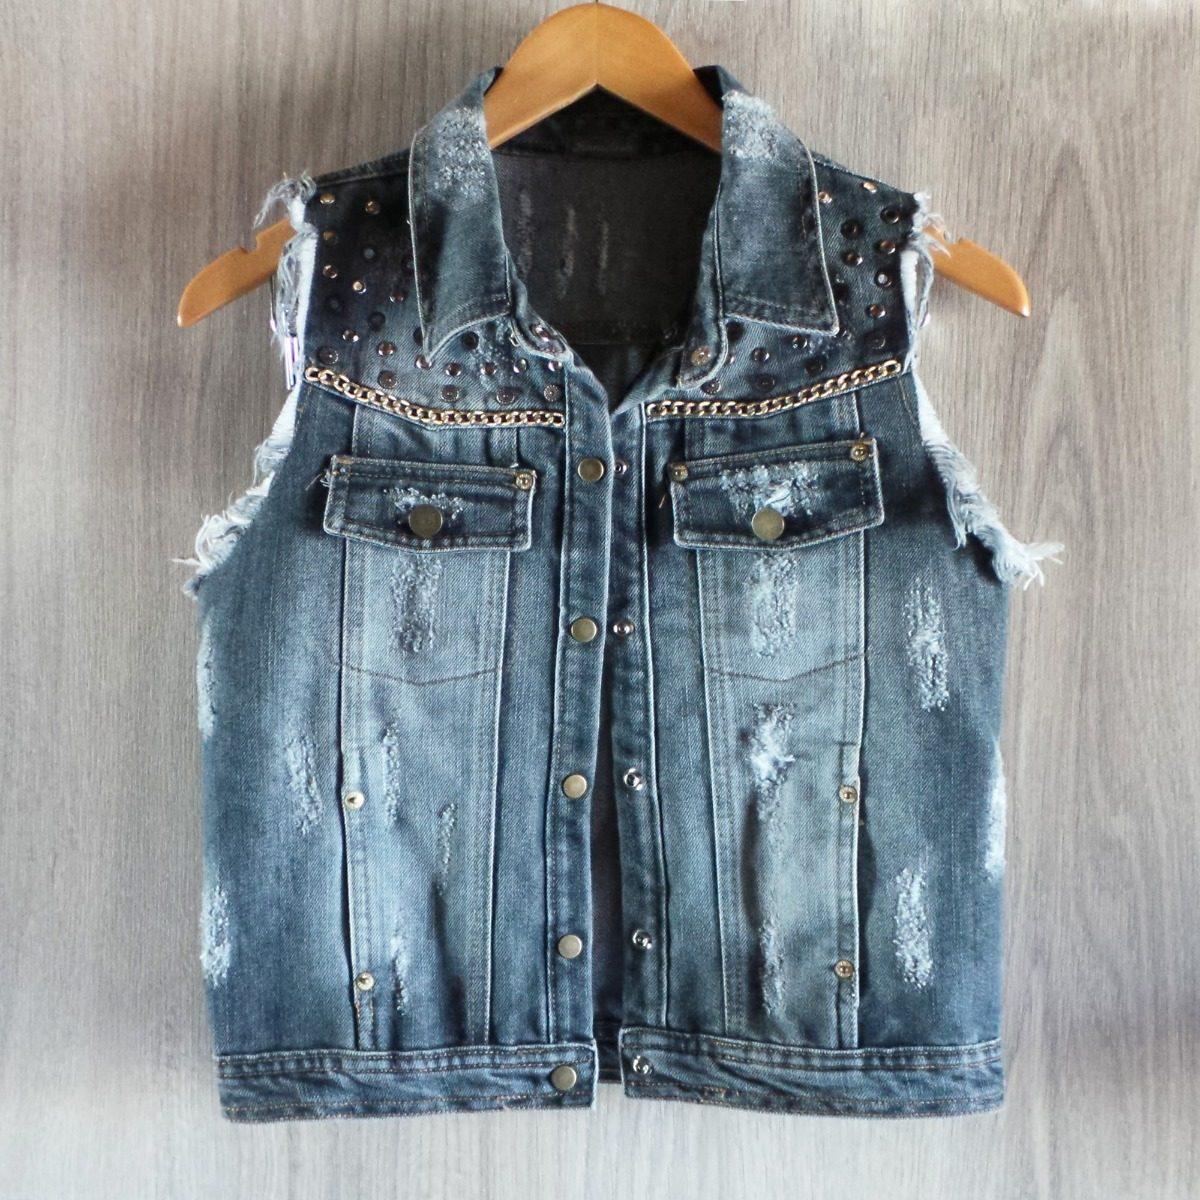 8b7b61f678d1 Colete Jeans Kamdesh Rasgado Destroyed Spike Estonado - R$ 189,00 em ...